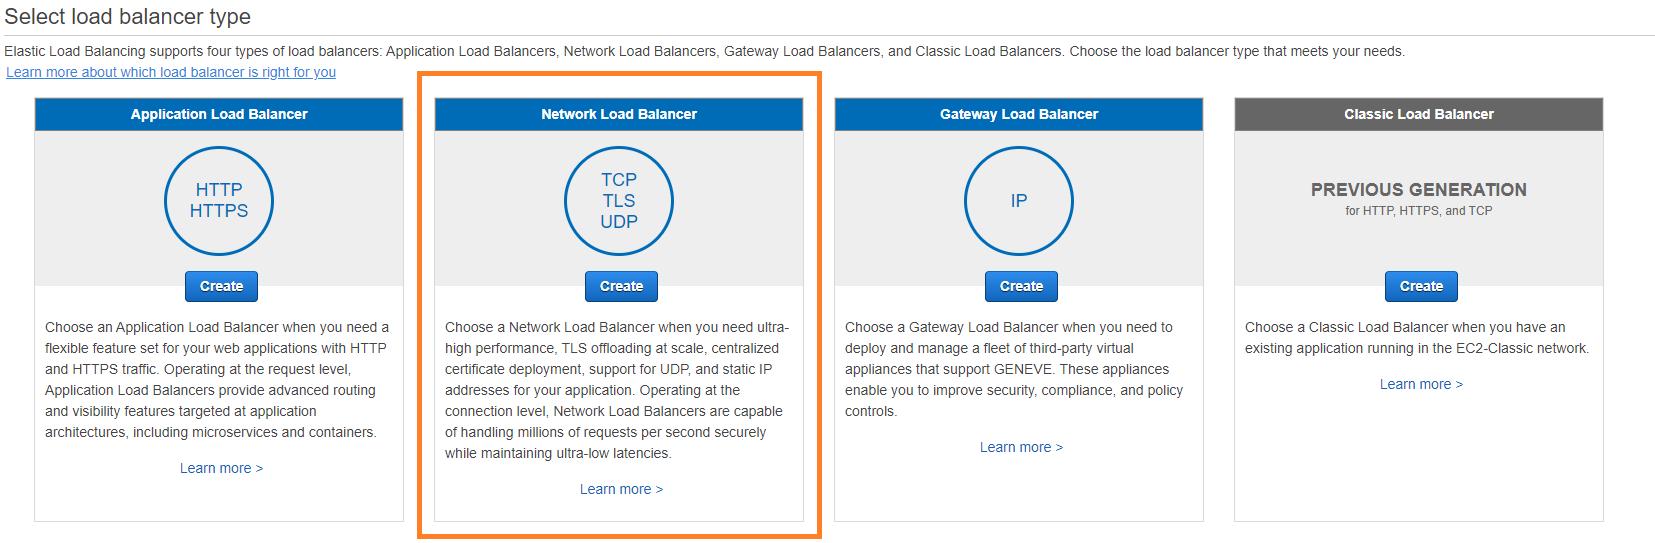 Creating a Network Load Balancer.